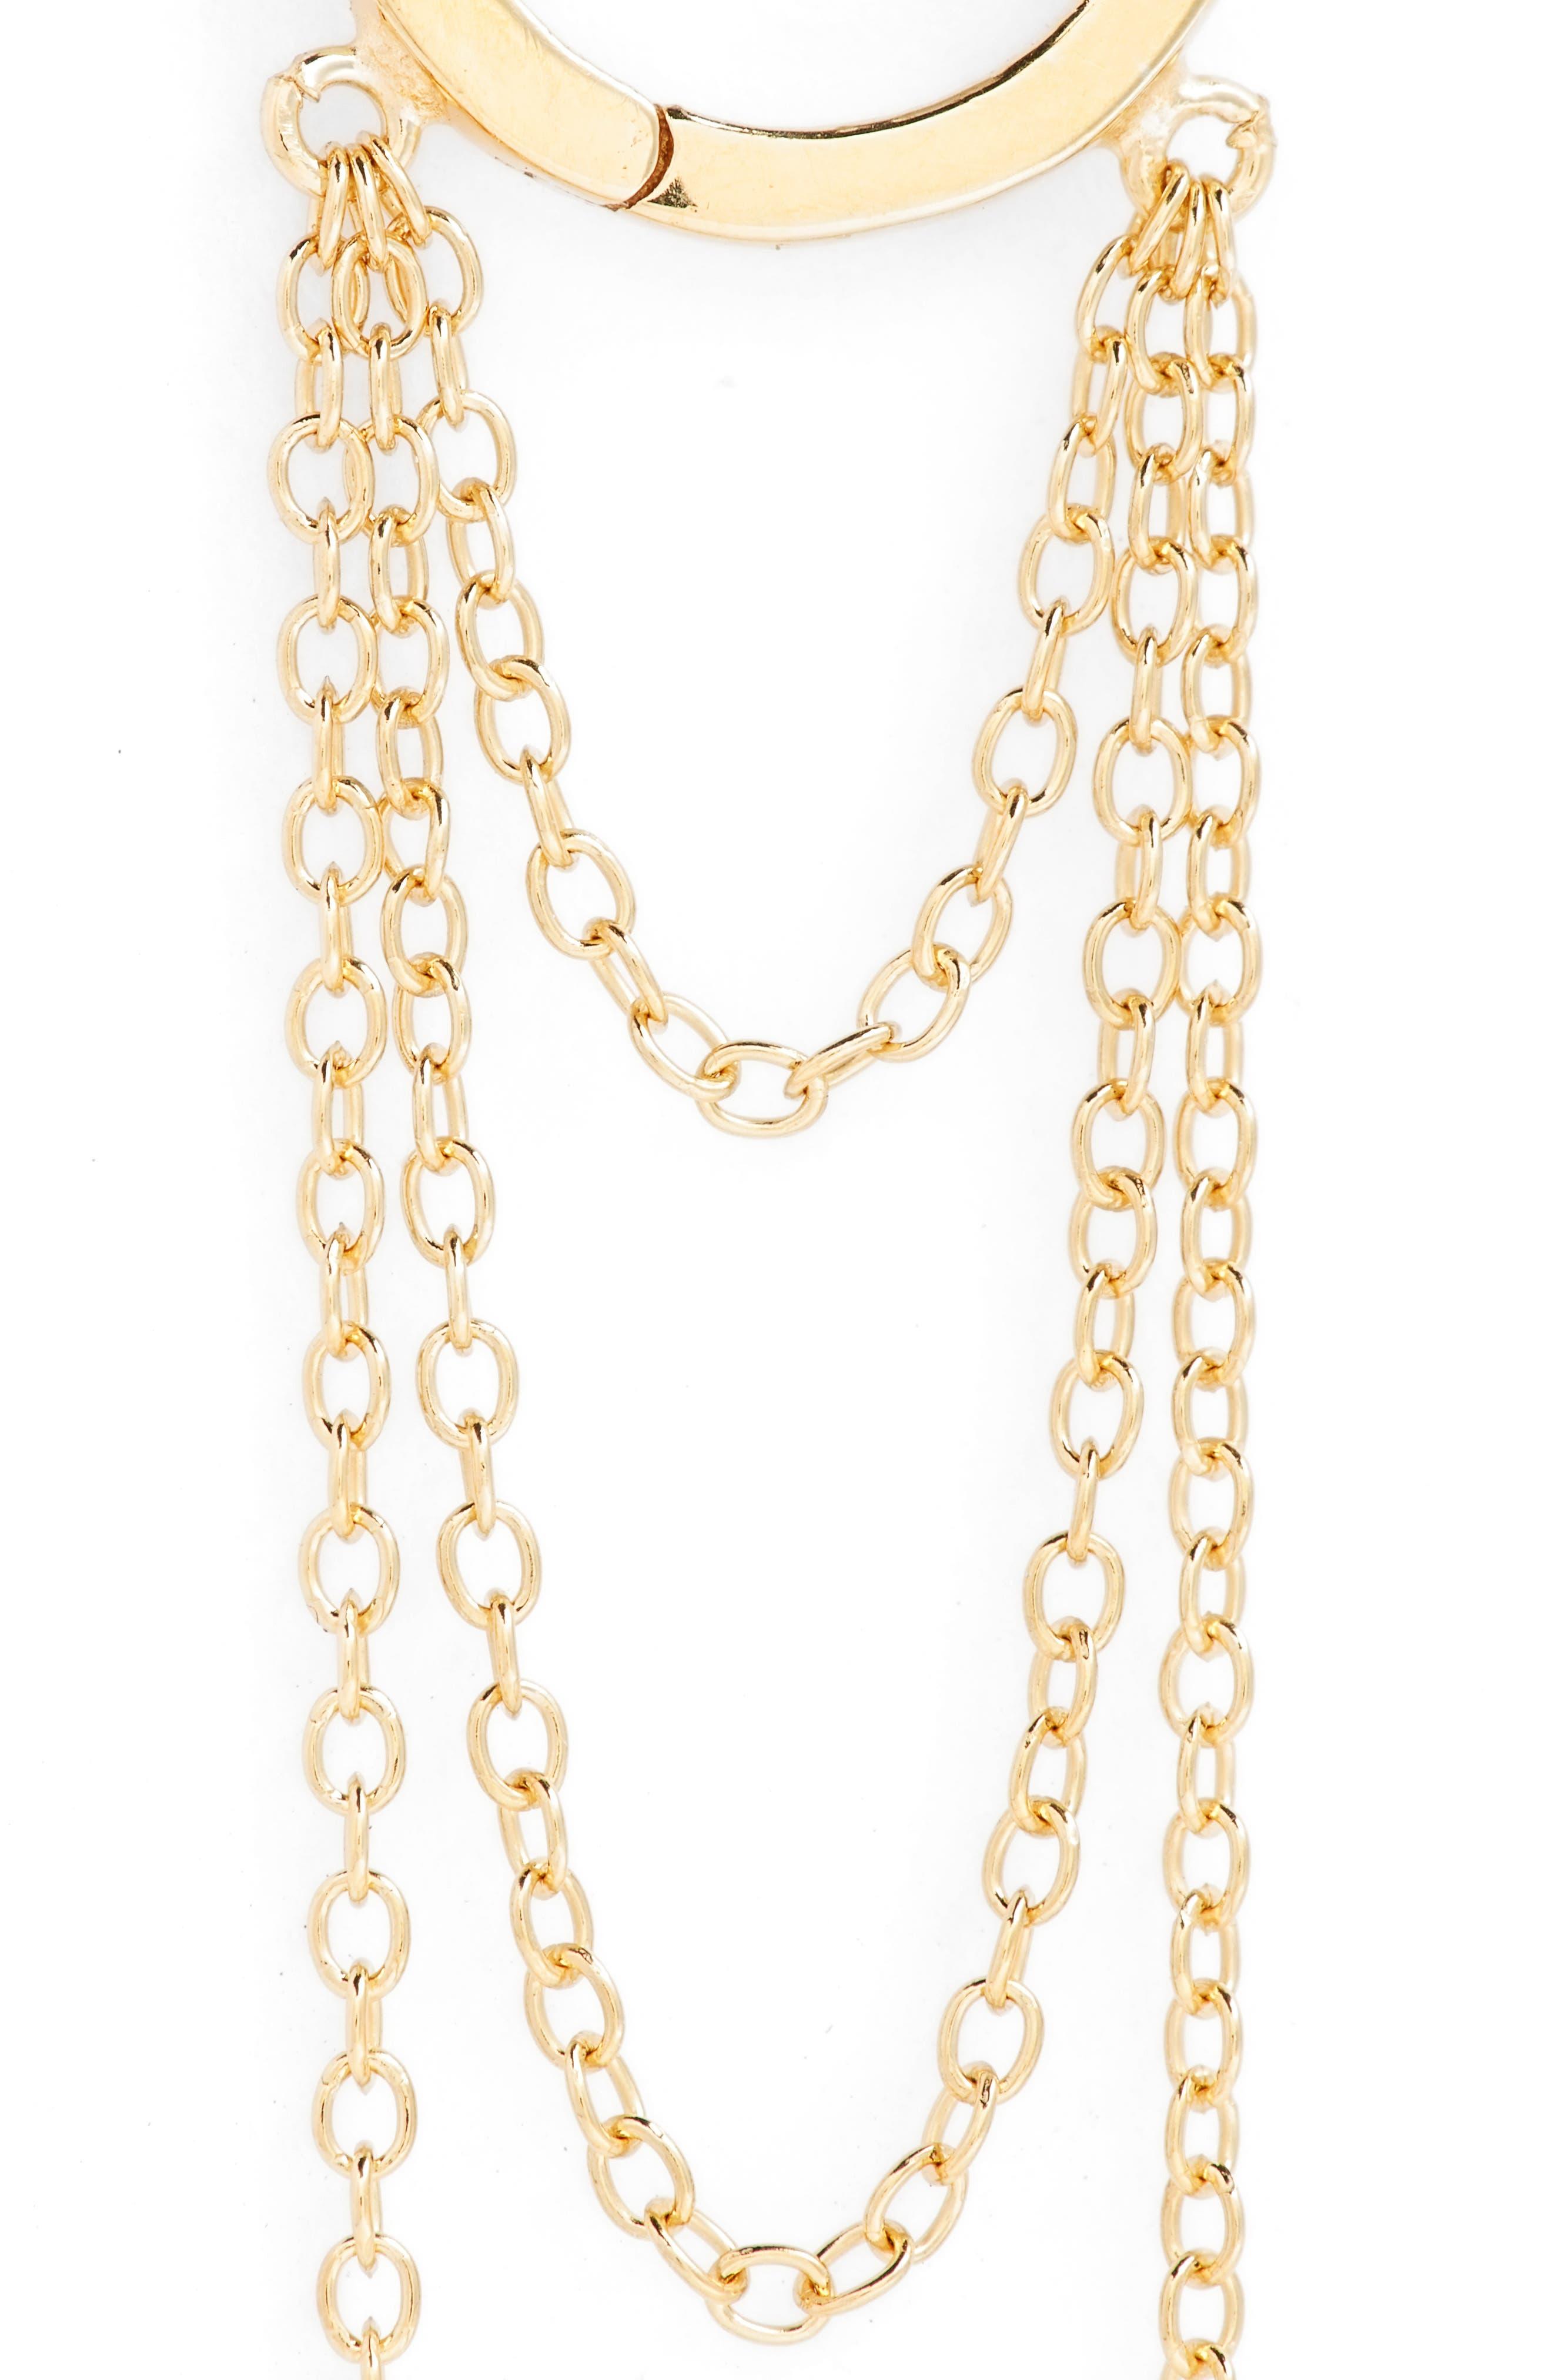 Elmar Huggie Chain earrings,                             Alternate thumbnail 5, color,                             710